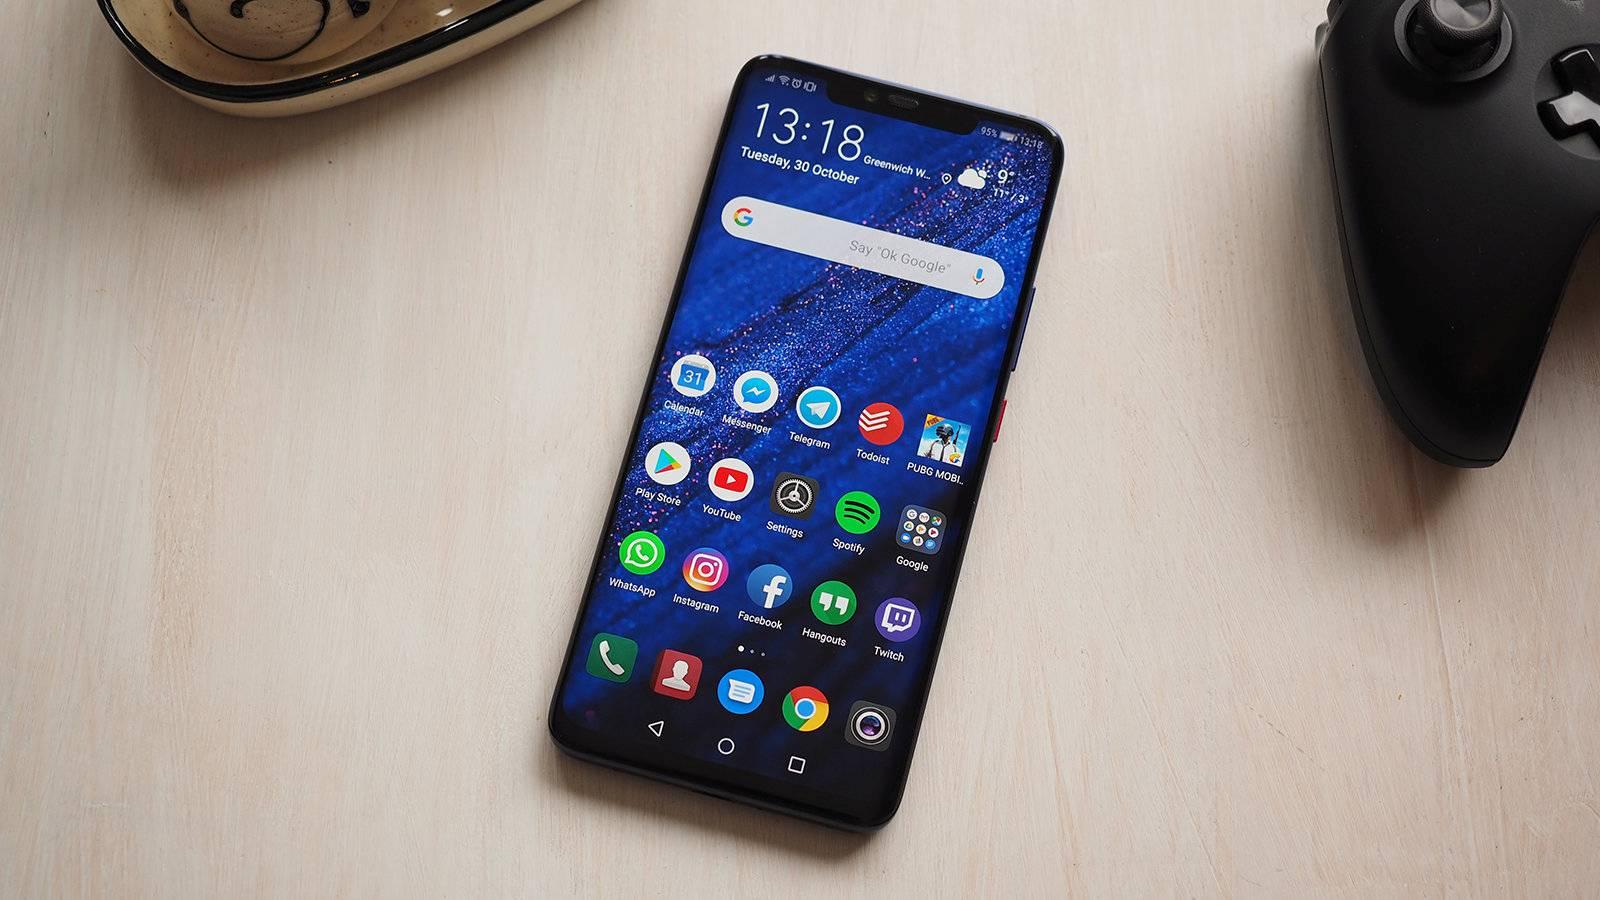 Telefoanele Huawei entuziasmeaza